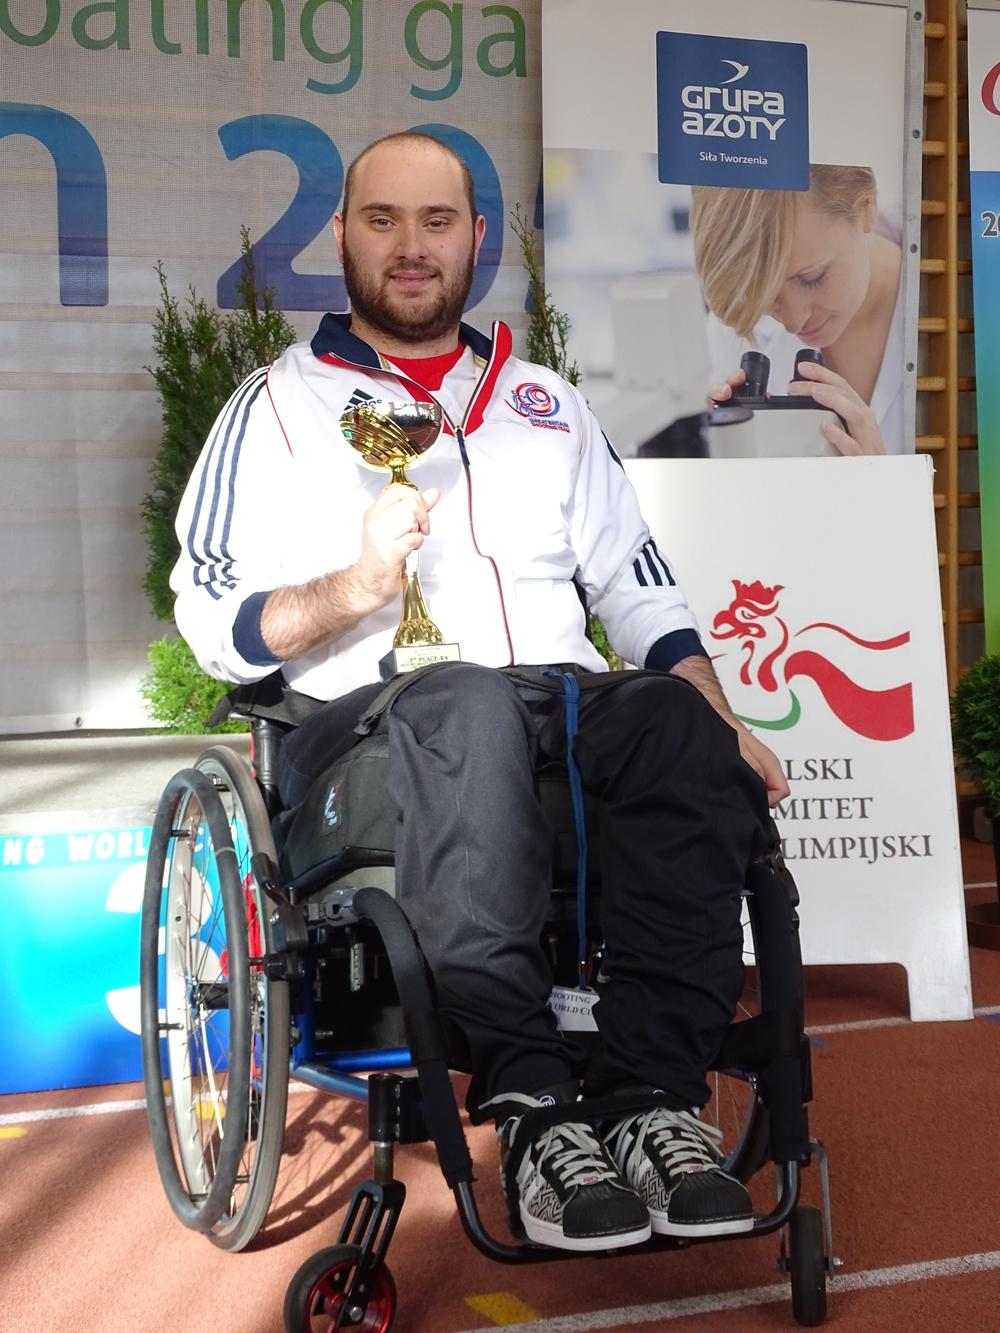 Ryan Cockbill, R4 Bronze medallist